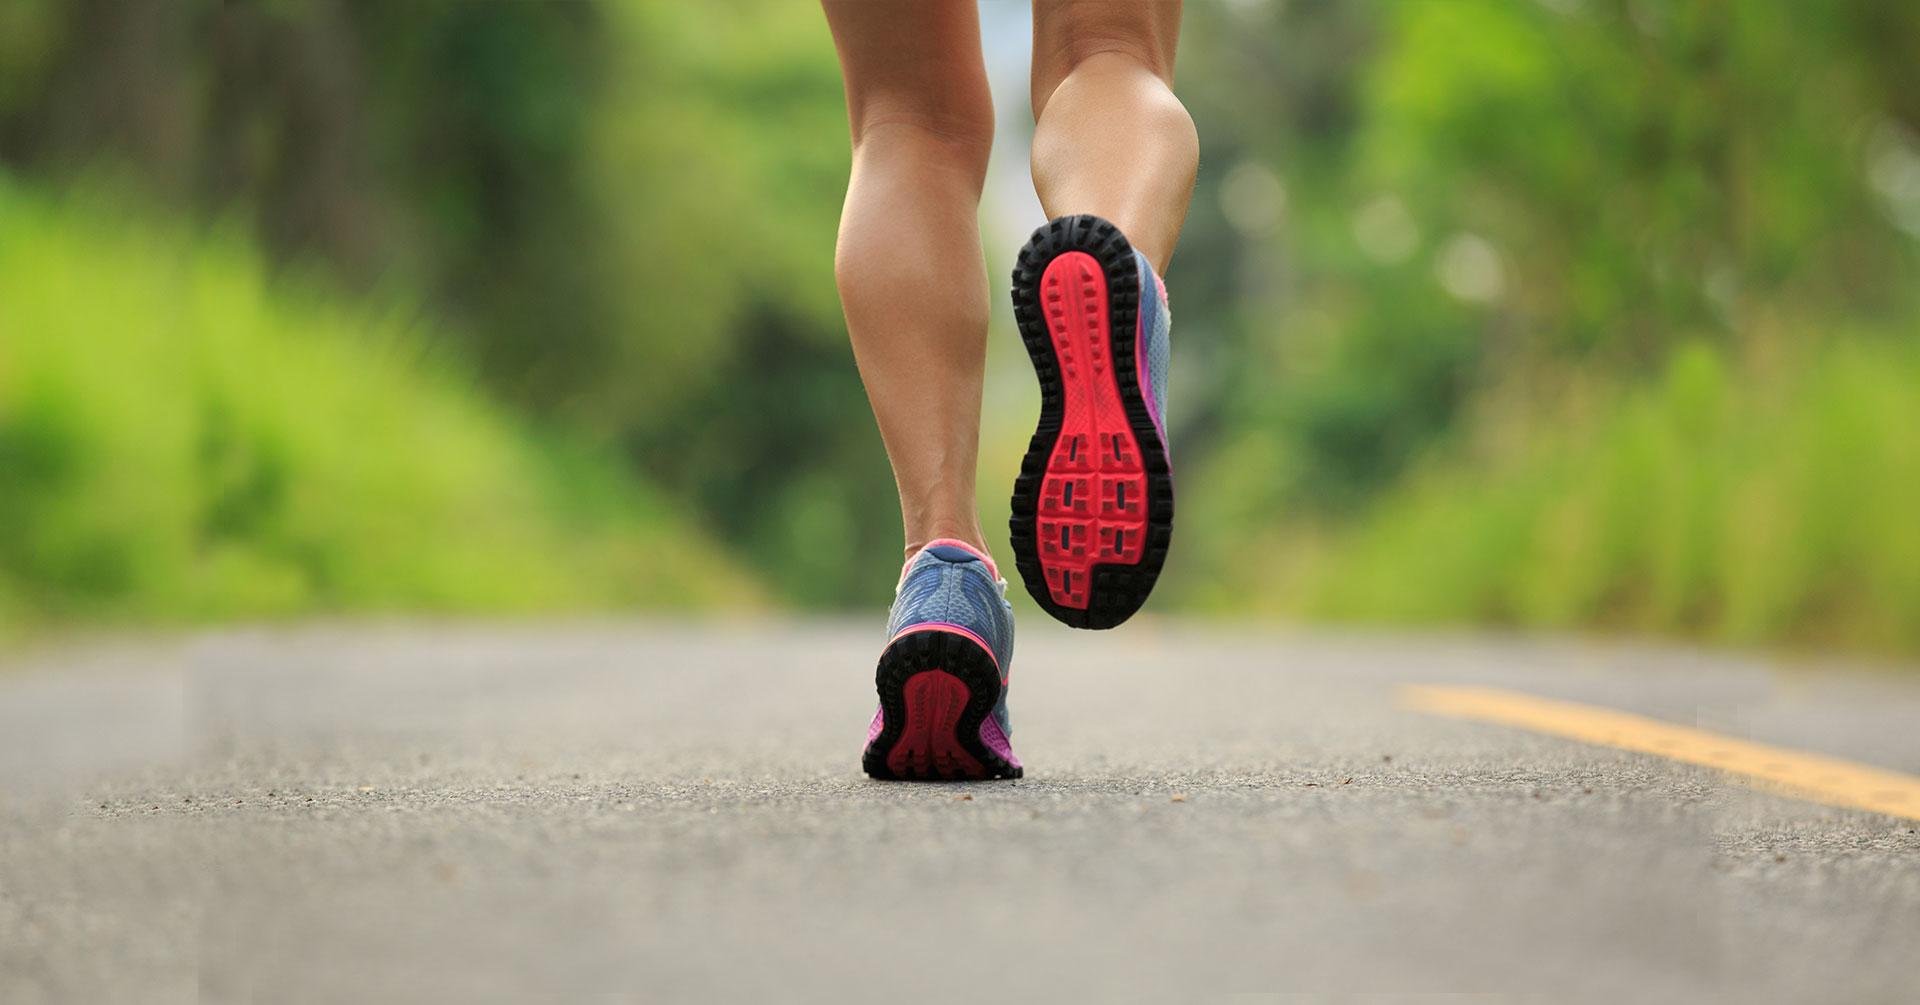 ¿Quieres empezar a correr? Evita estos 6 errores de principiantes